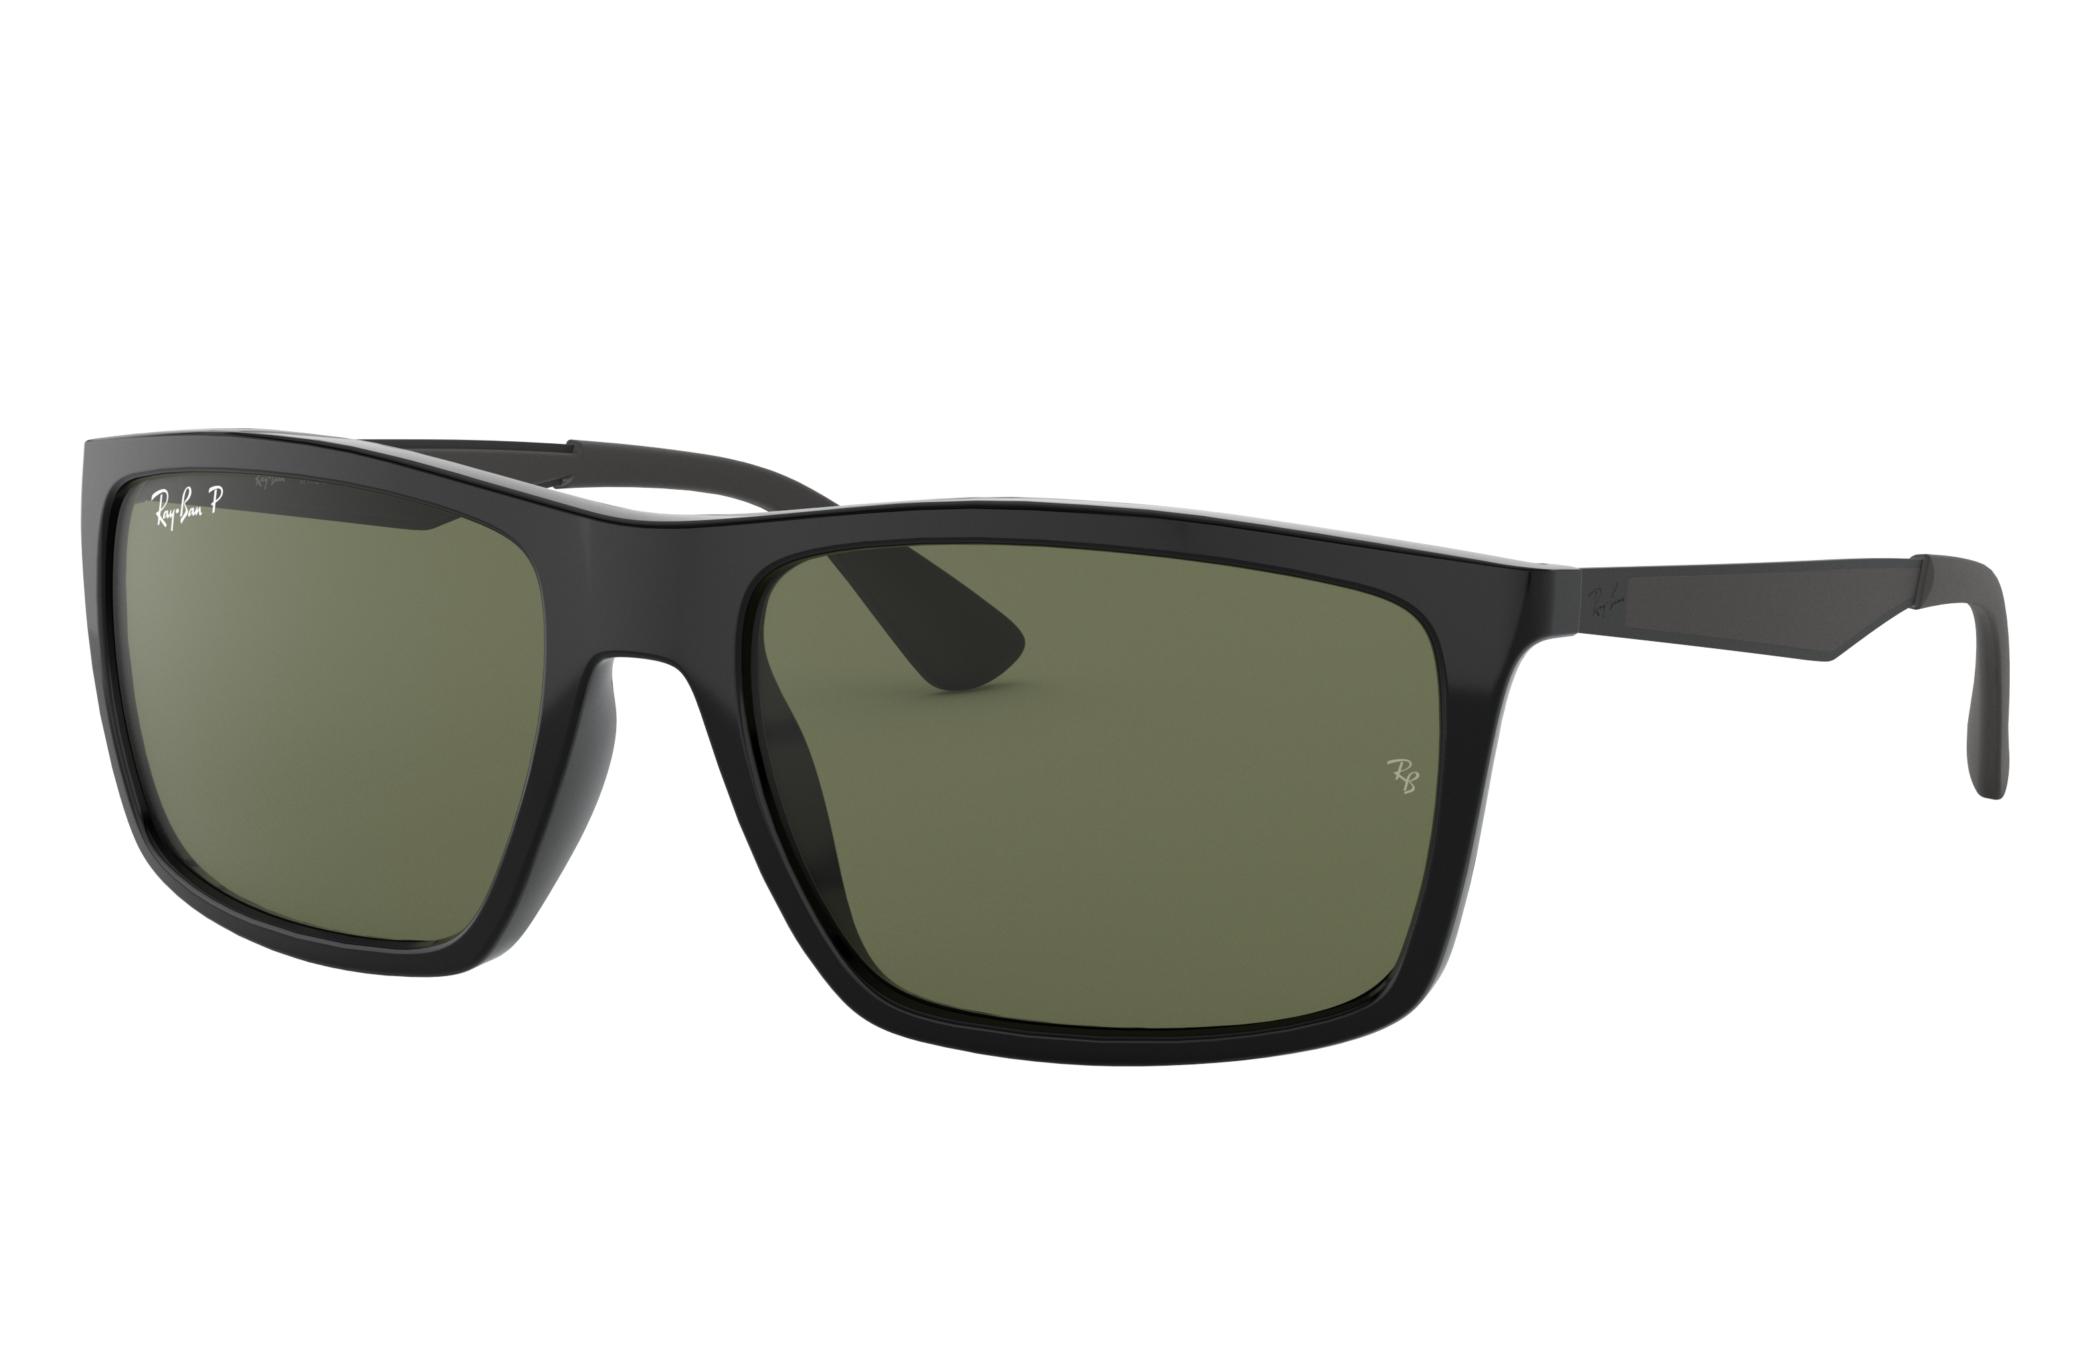 Ray-Ban Rb4228 Black, Polarized Green Lenses - RB4228